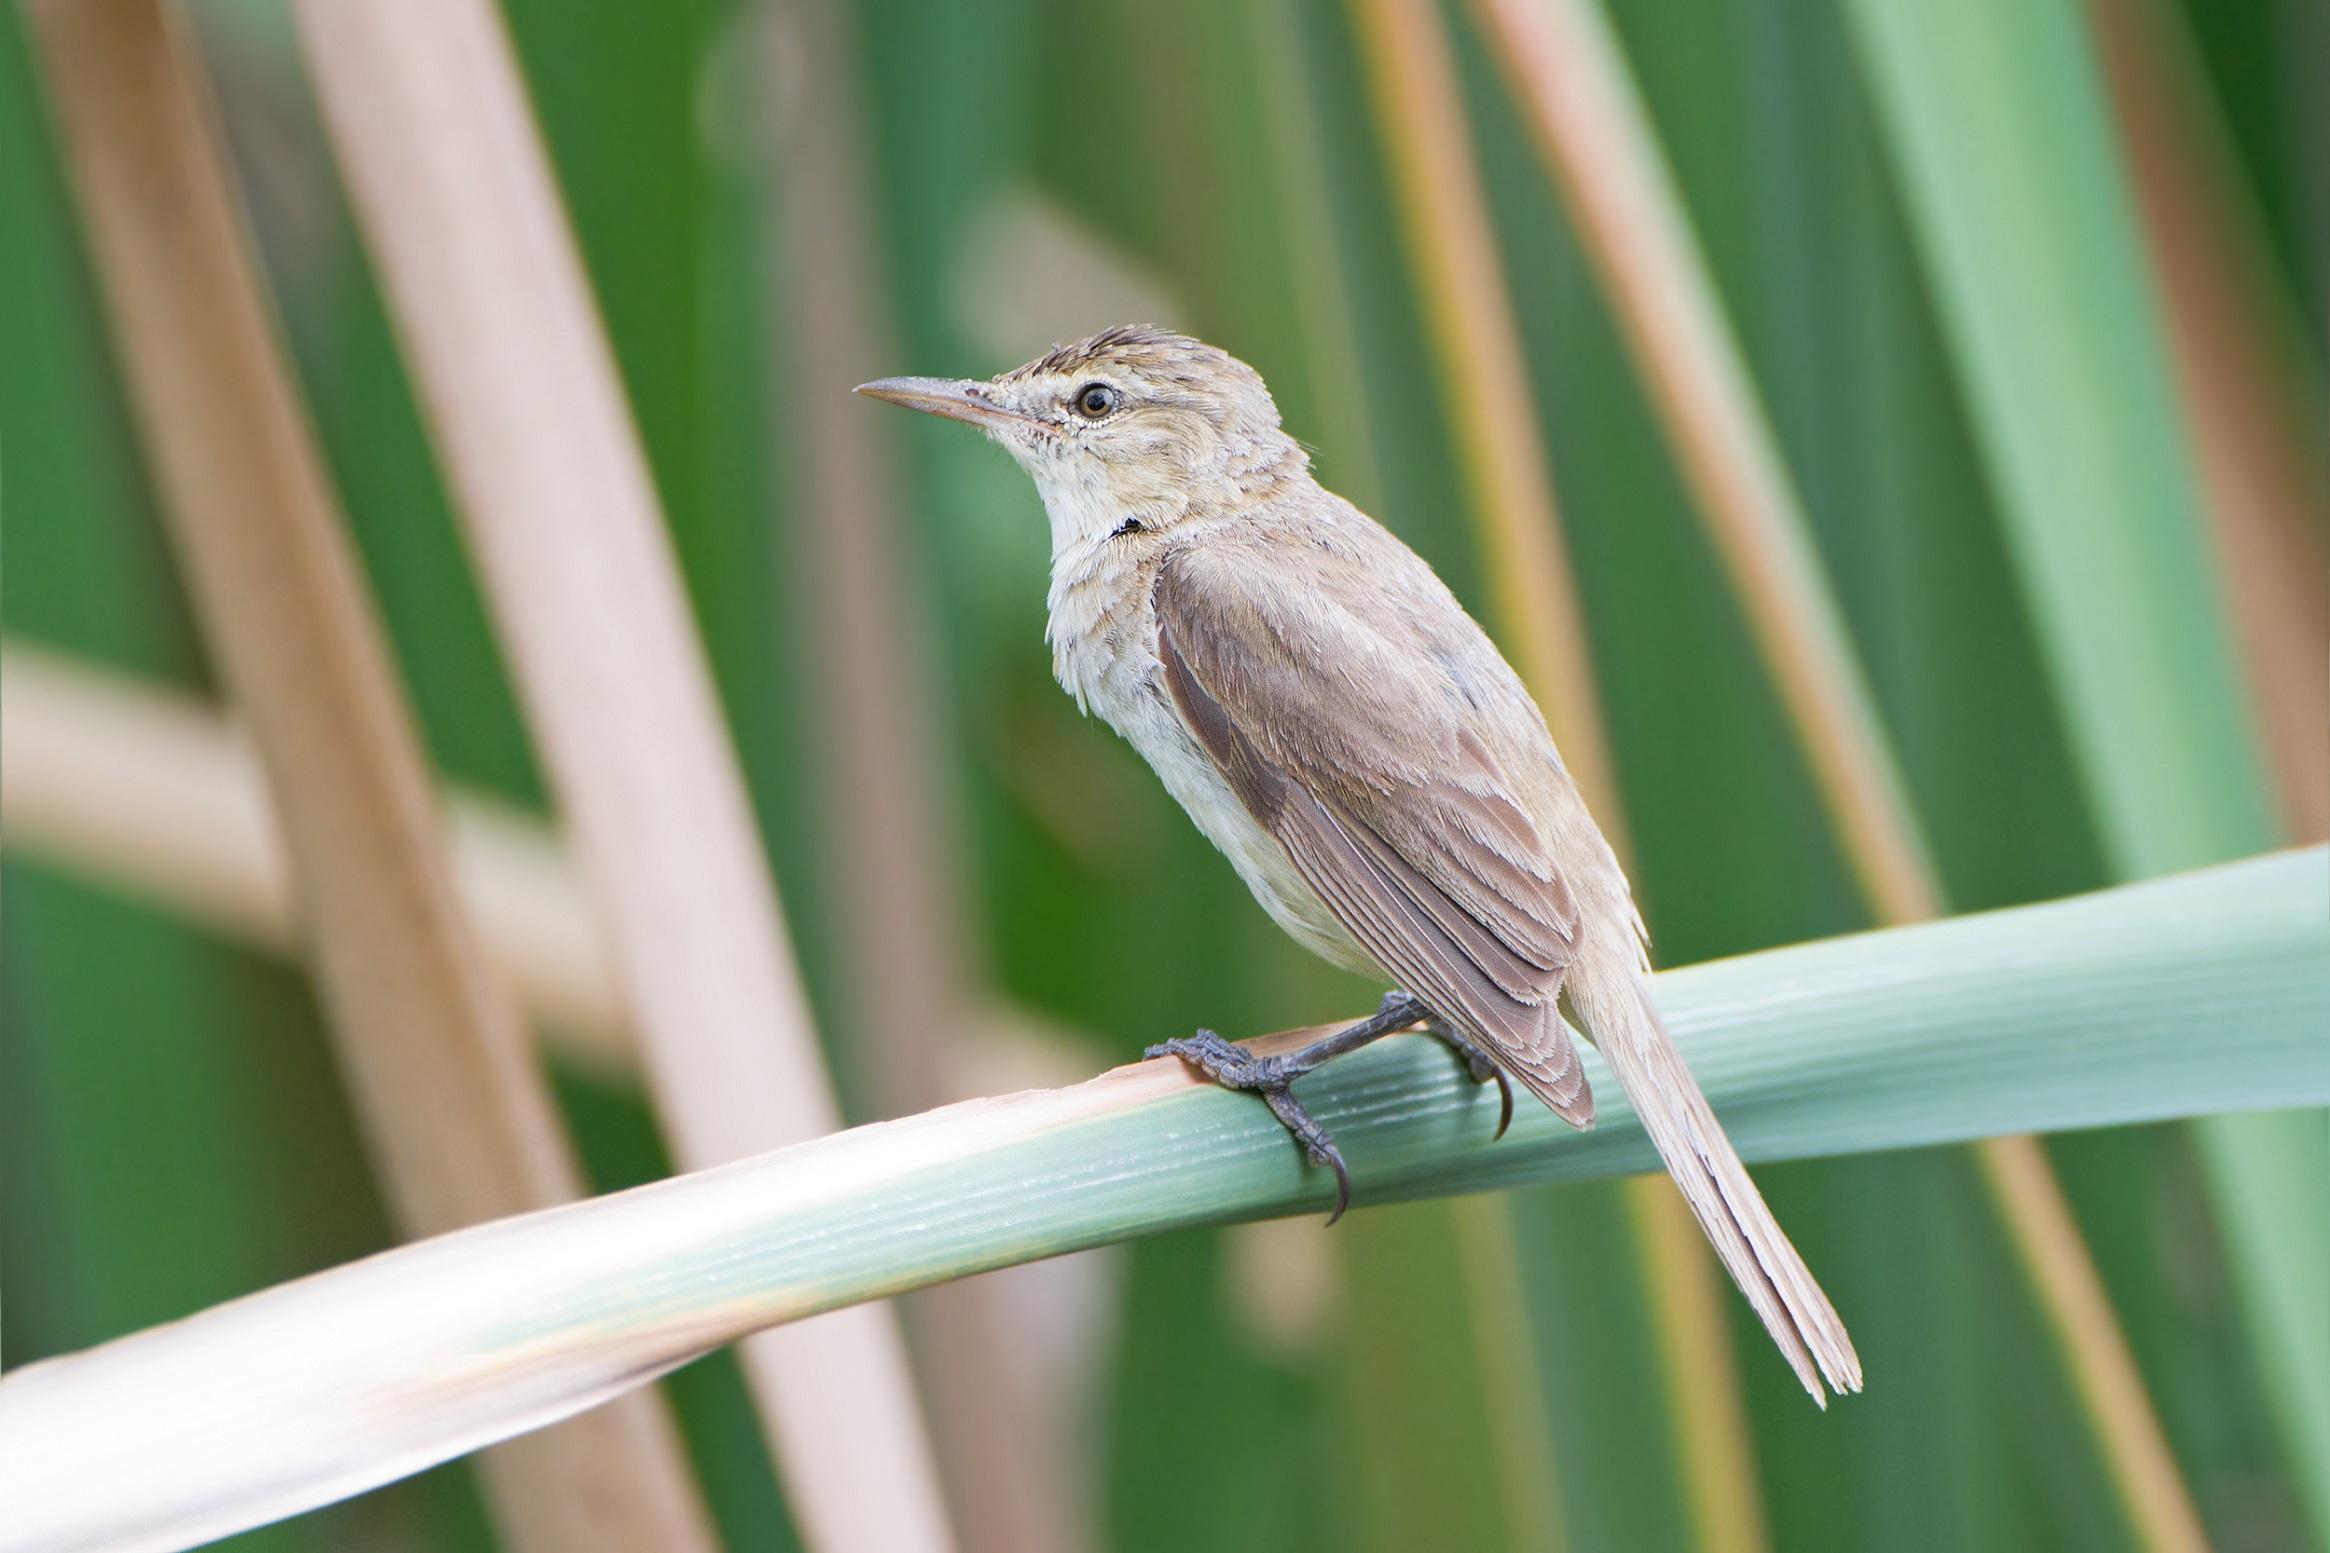 Australian reed warbler in the swamp